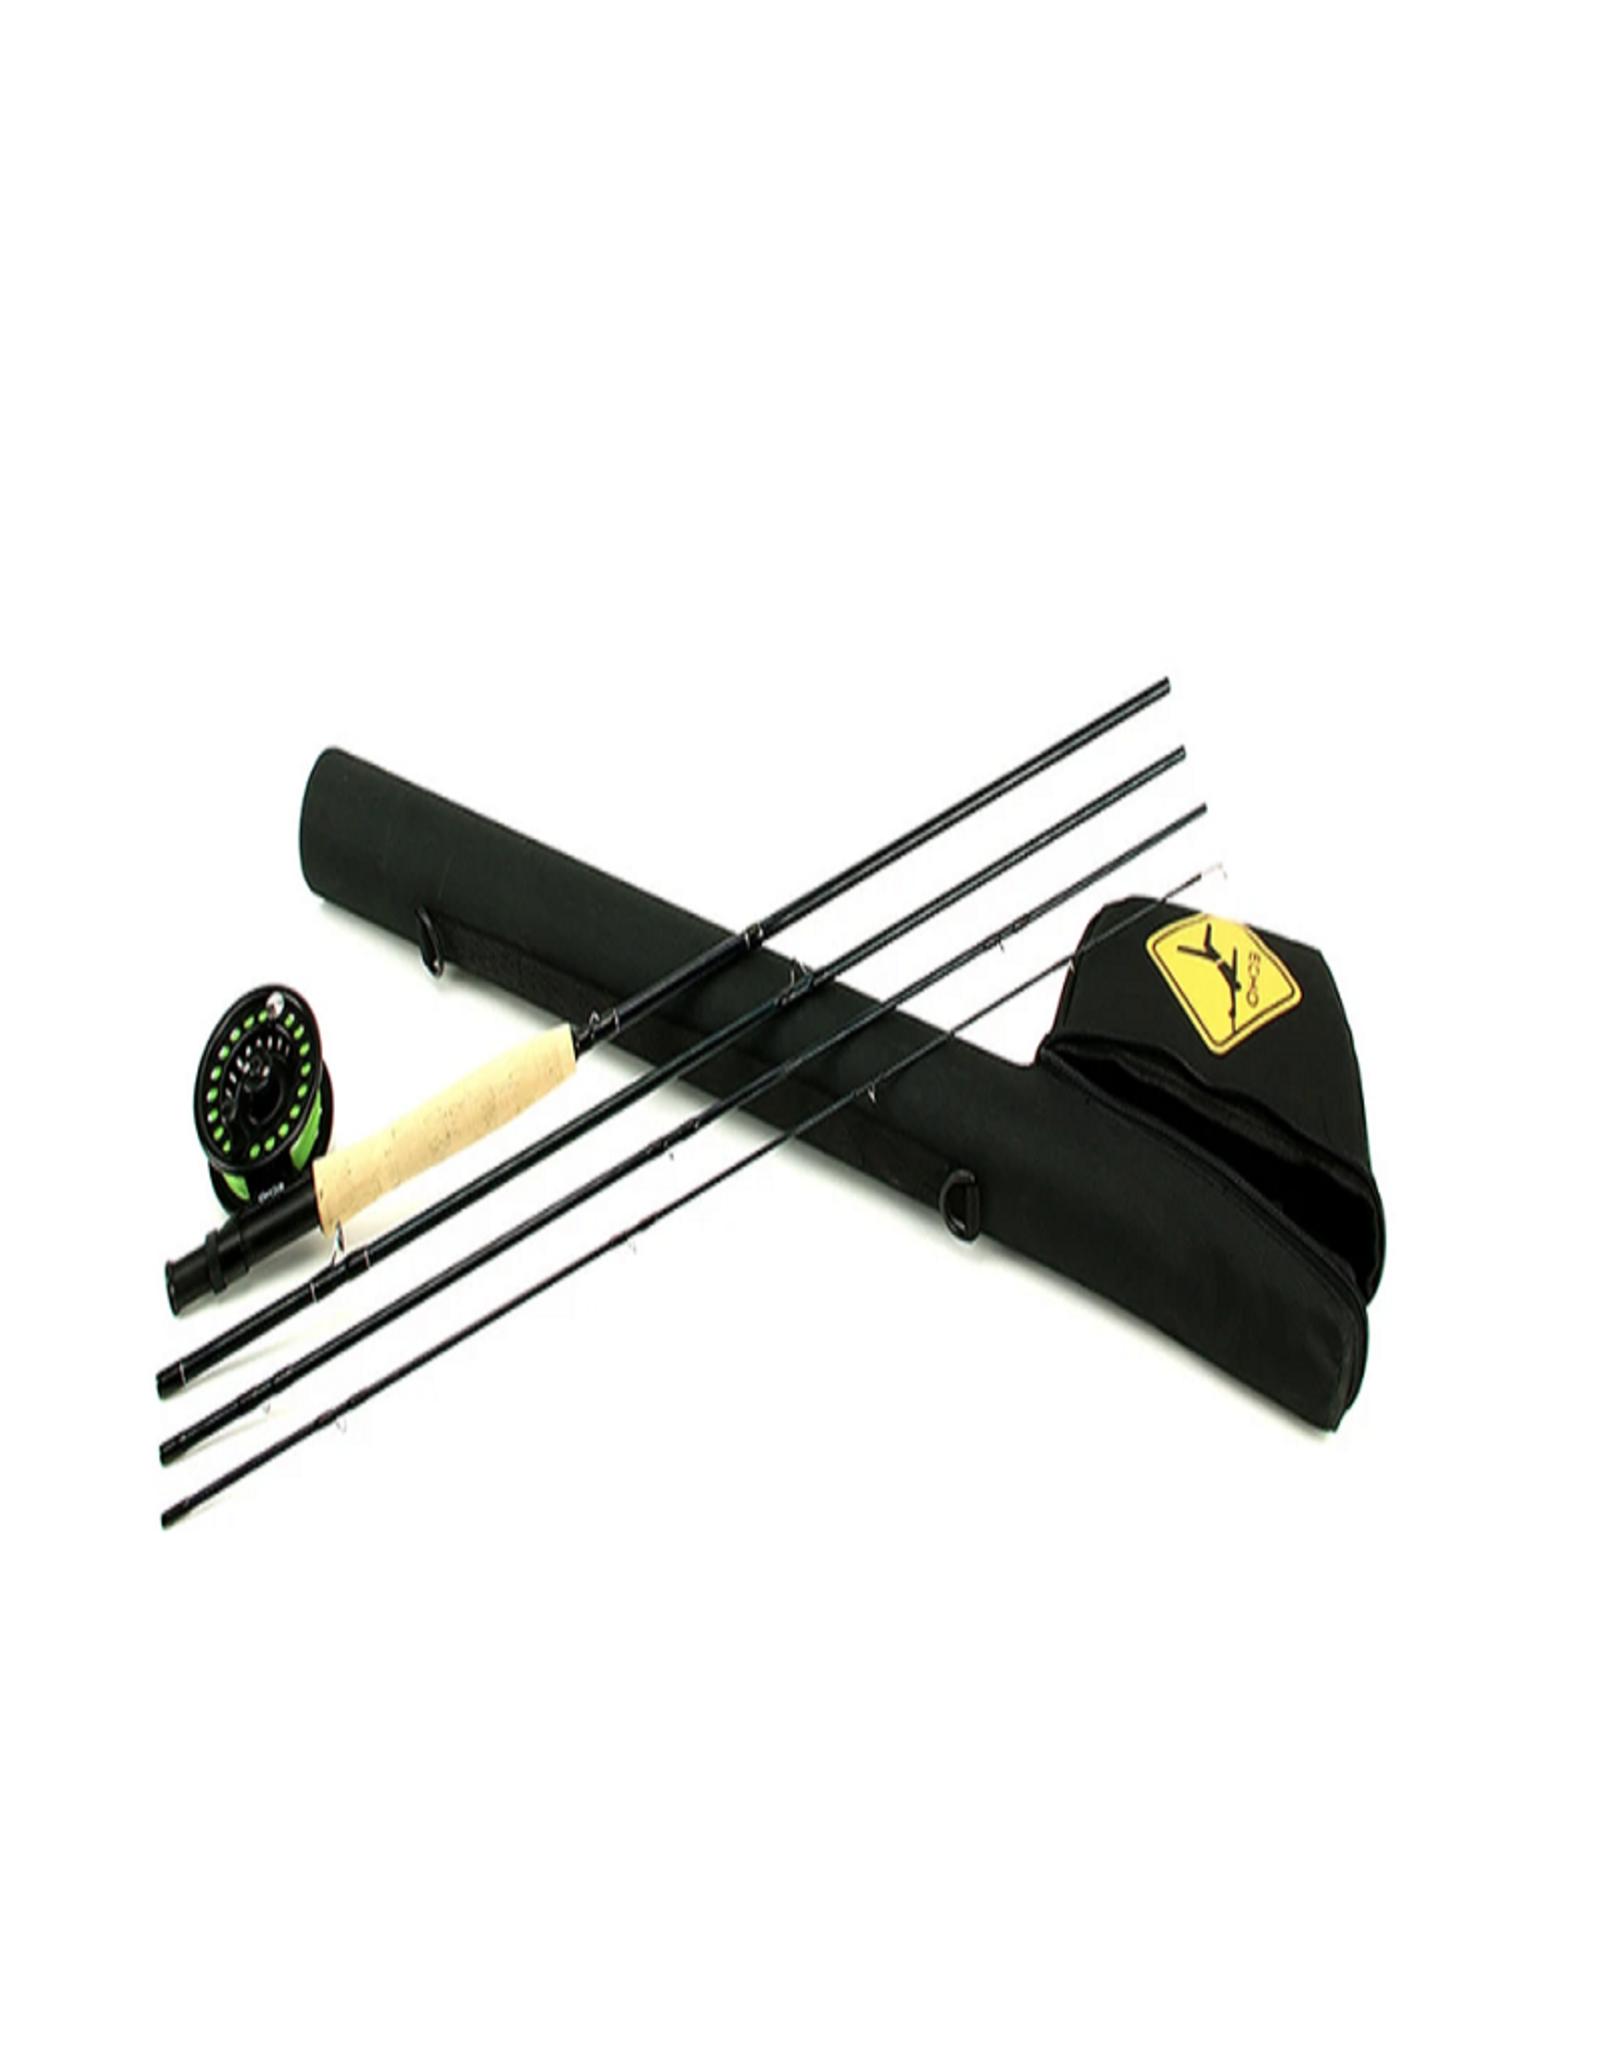 Echo Echo Base Fly Rod Kit